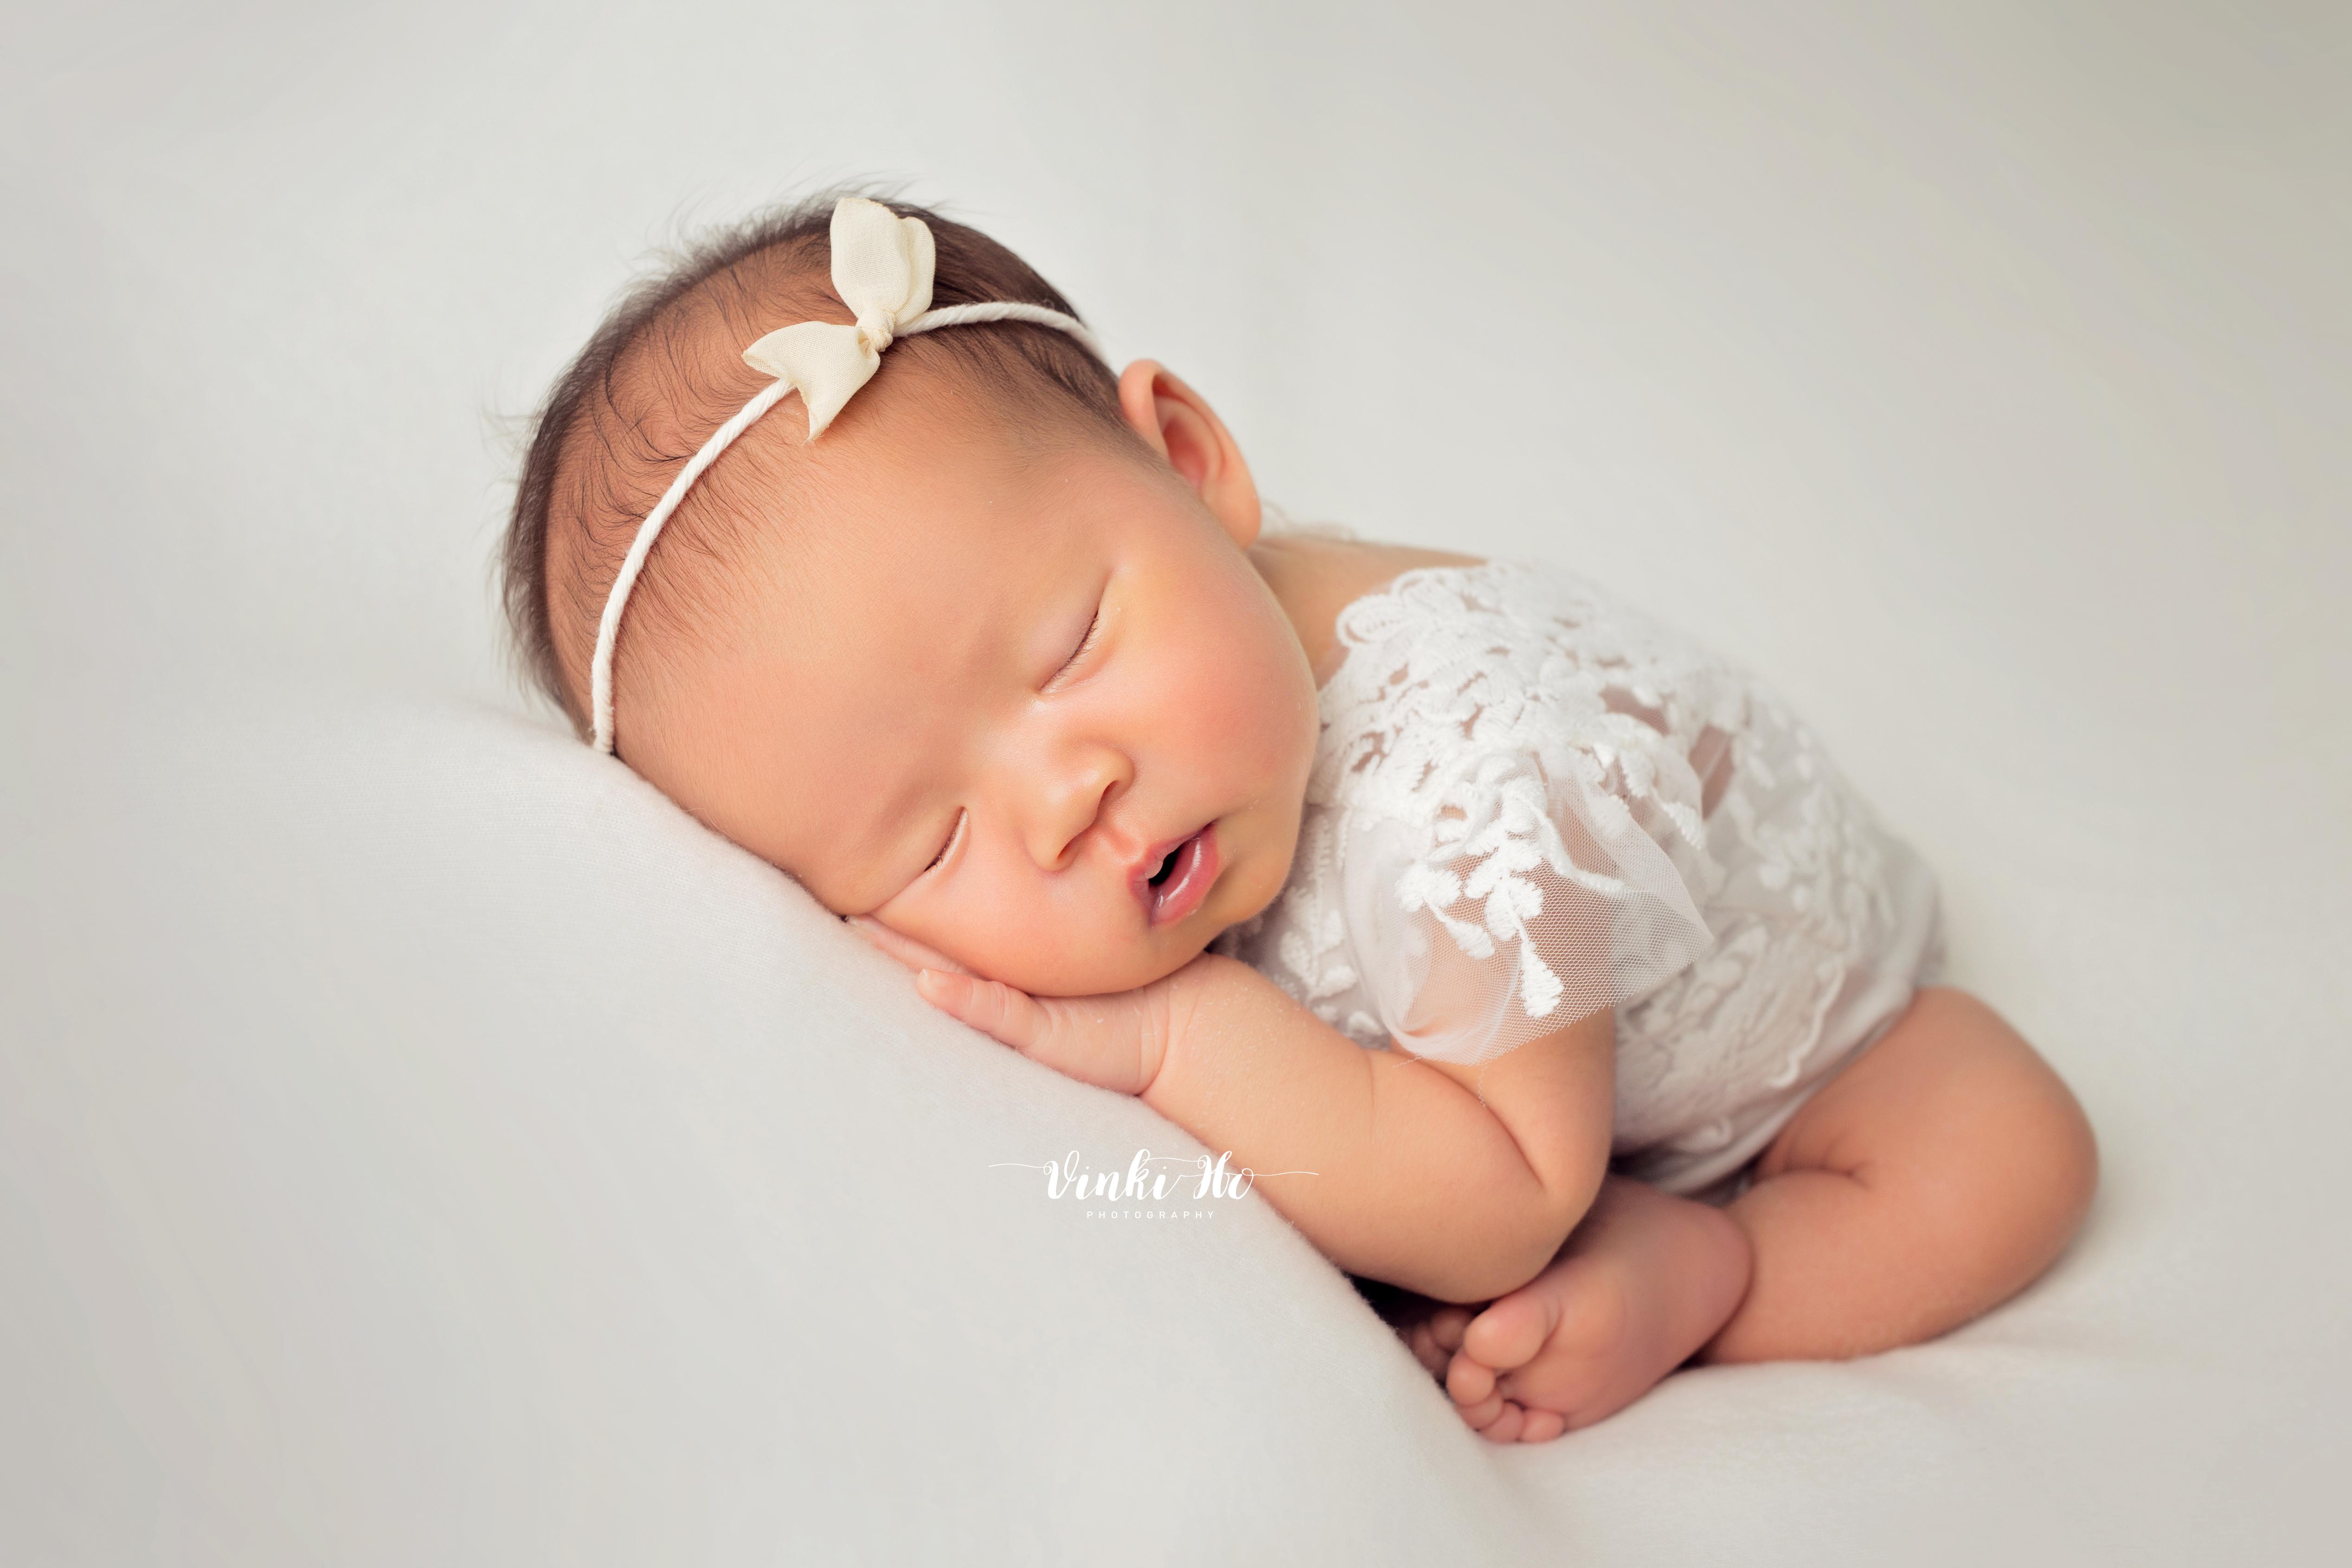 Baby Lexa ~ 17days old